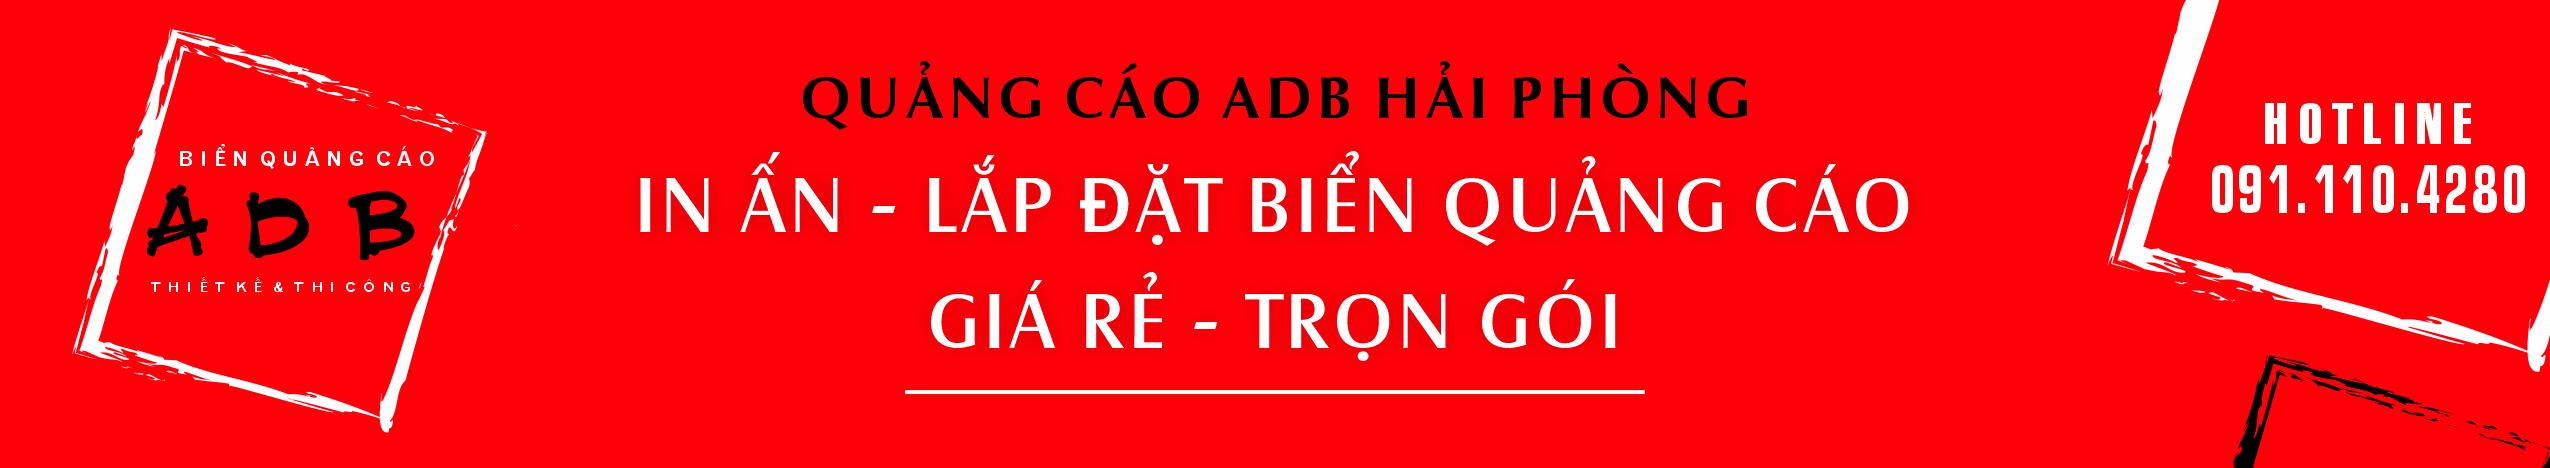 Quảng Cáo ADB